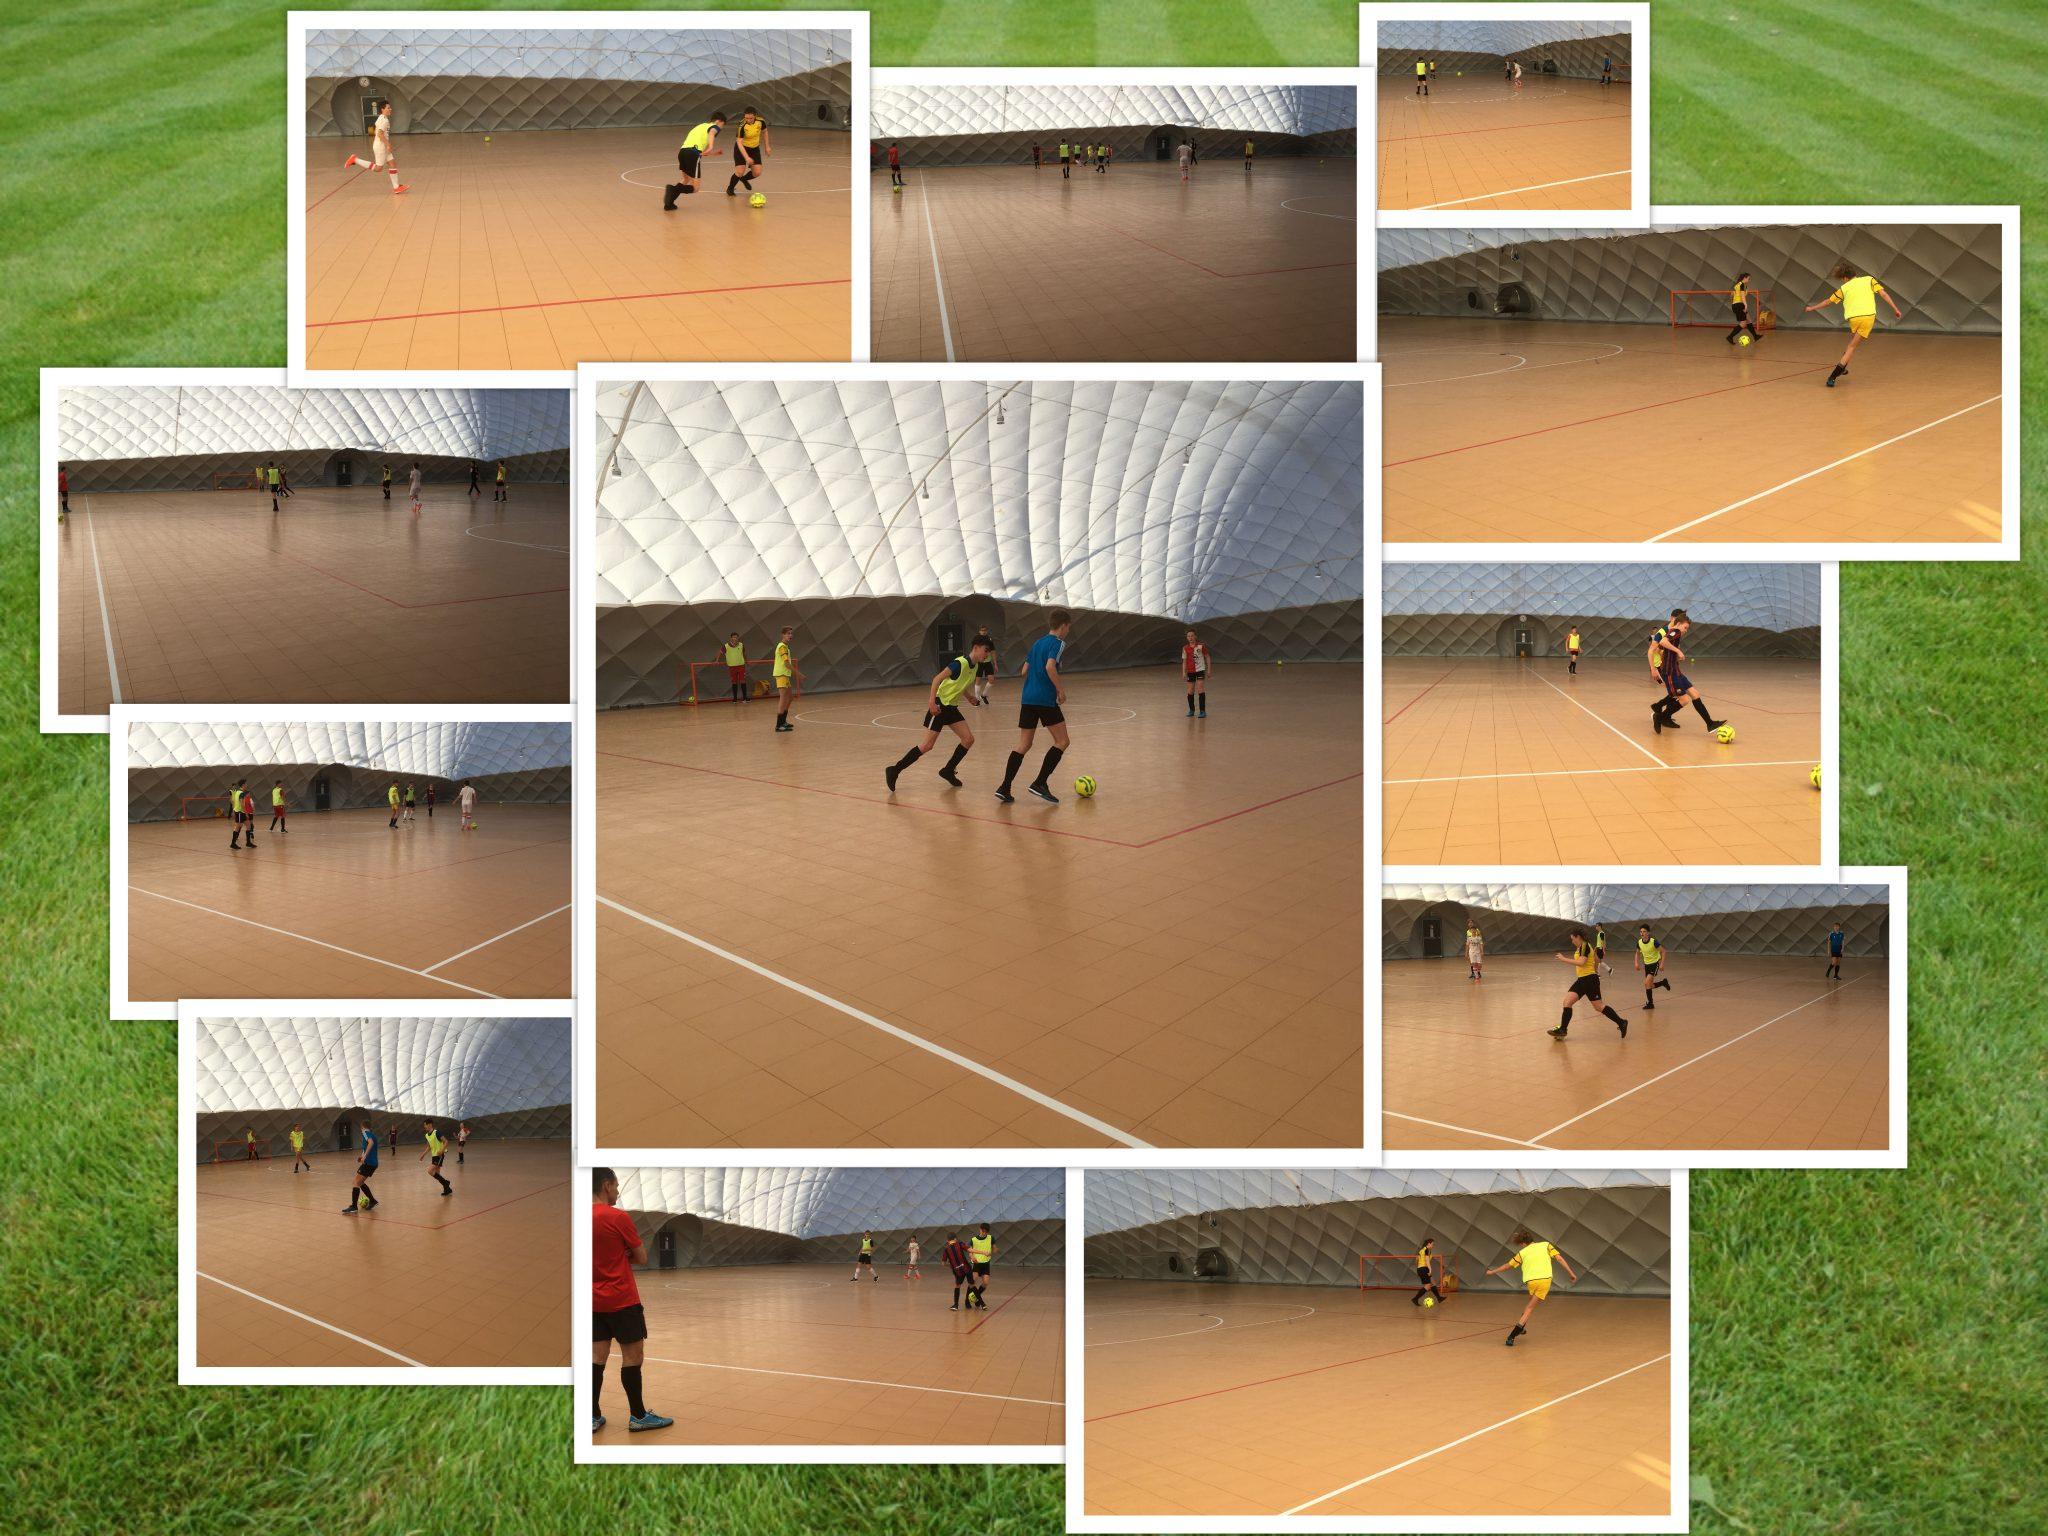 JO15-1 voetbalt in de Airdome luchthal